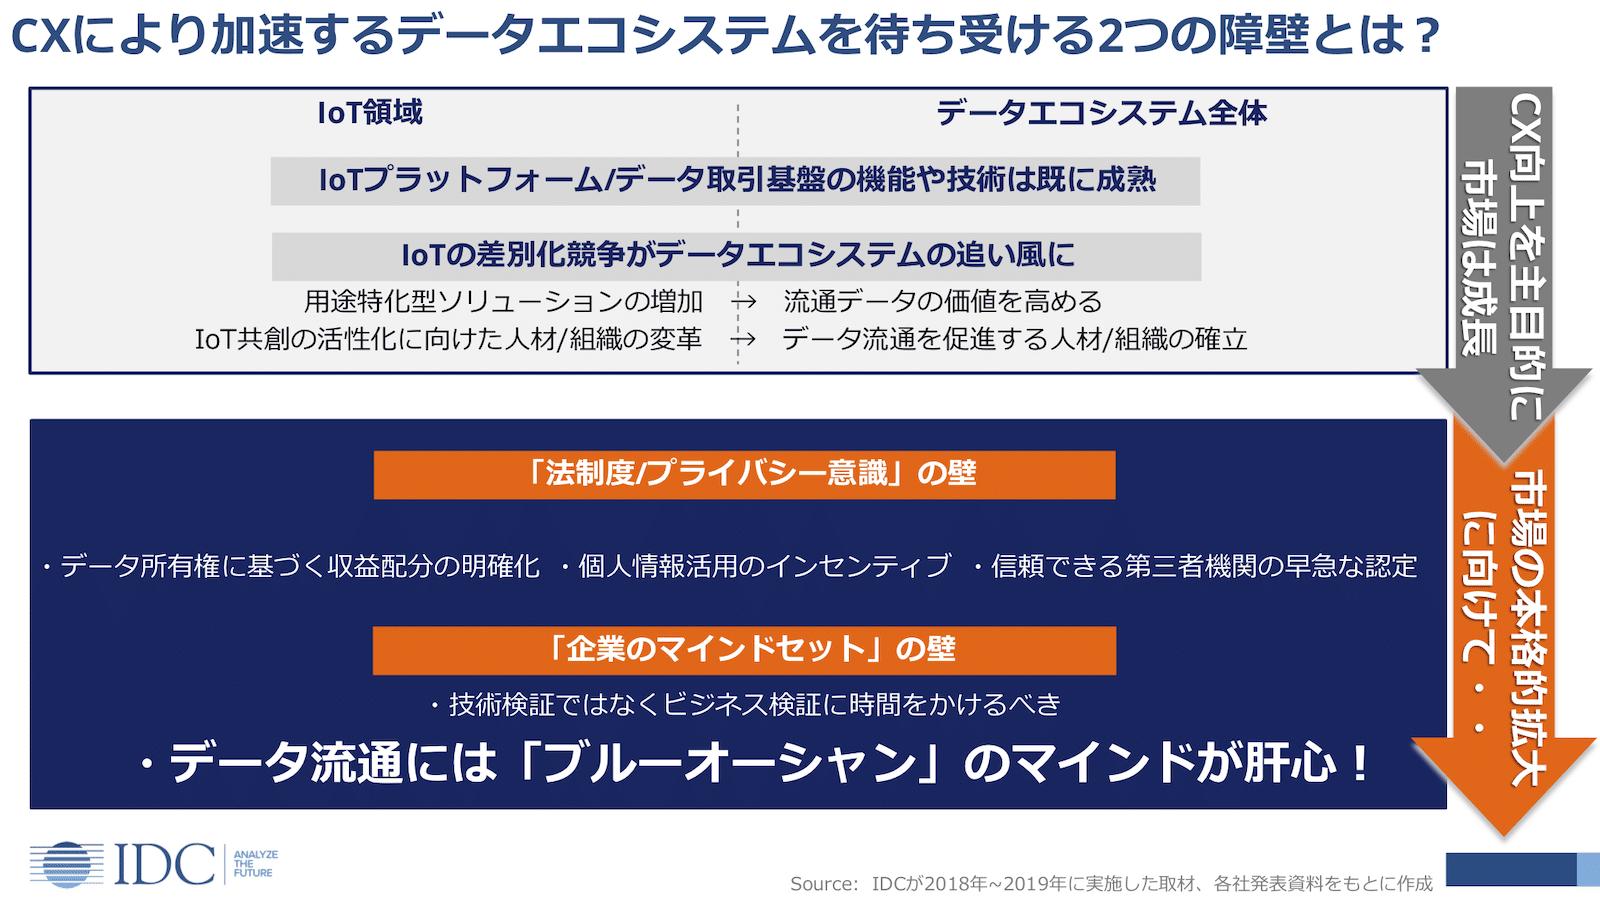 IoTデータエコシステムの拡大を阻む可能性がある障壁(出典:IDC Japan)